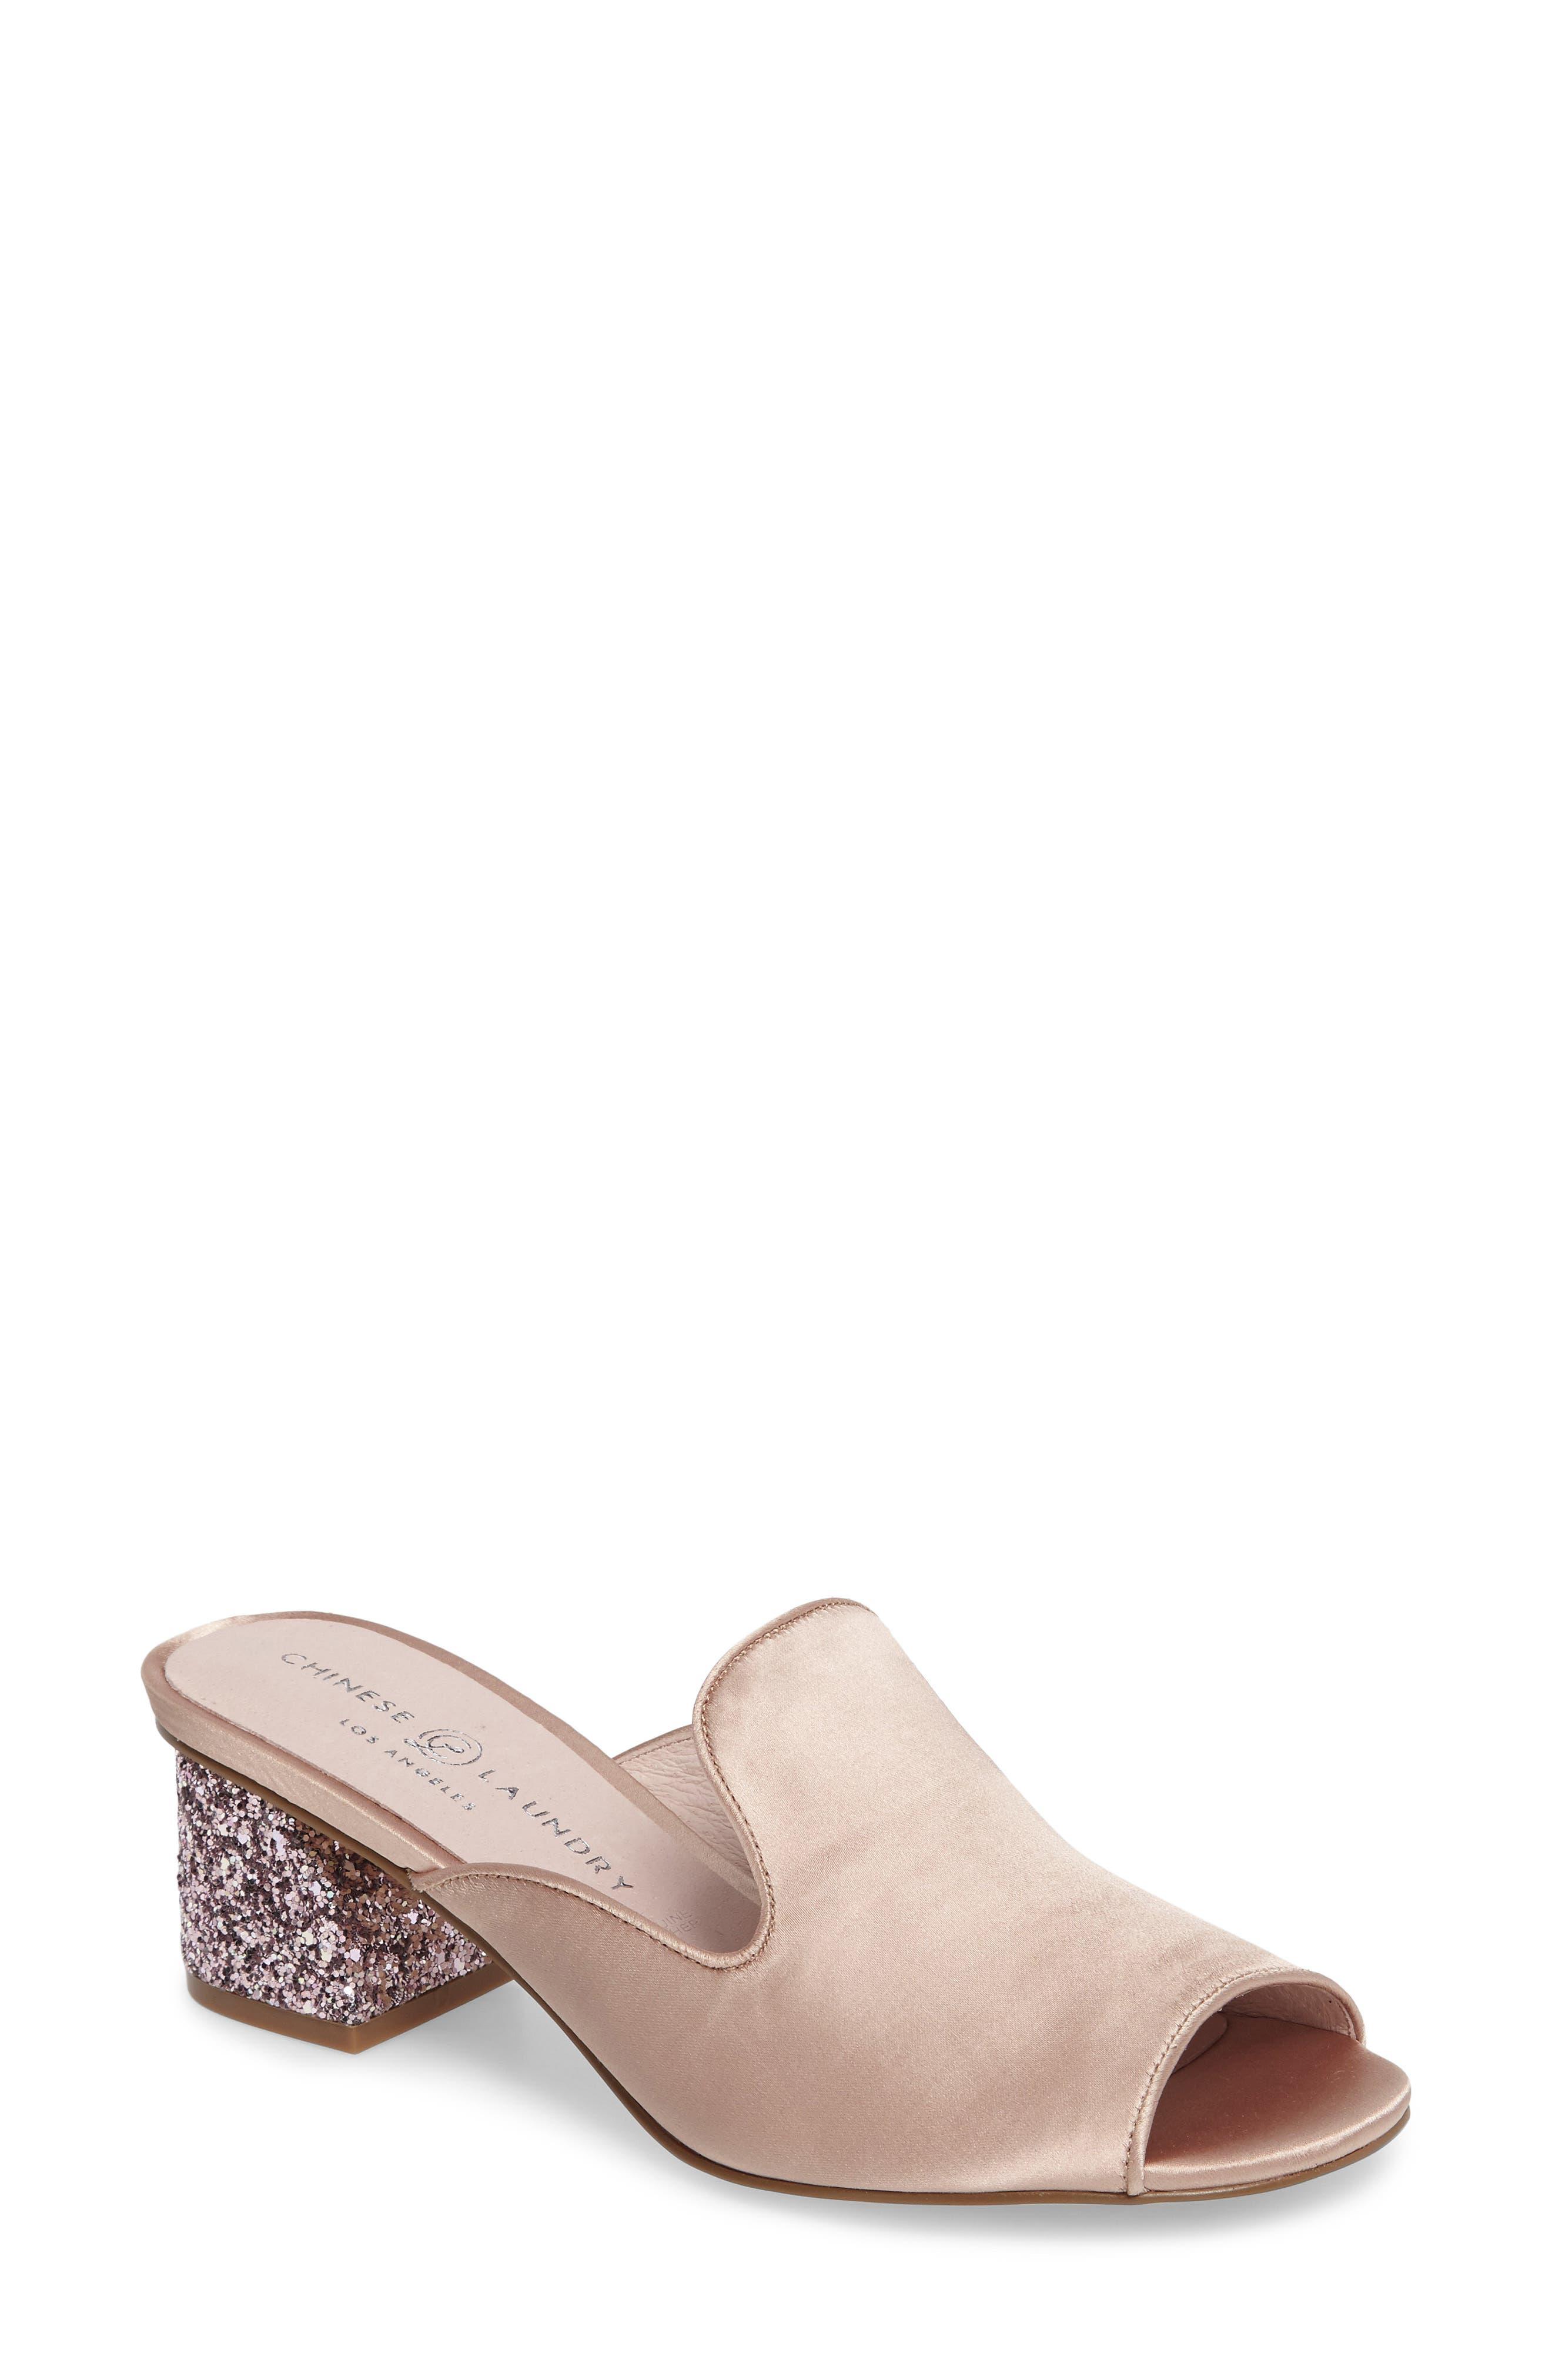 Alternate Image 1 Selected - Chinese Laundry Mara Glitter Loafer Mule (Women)